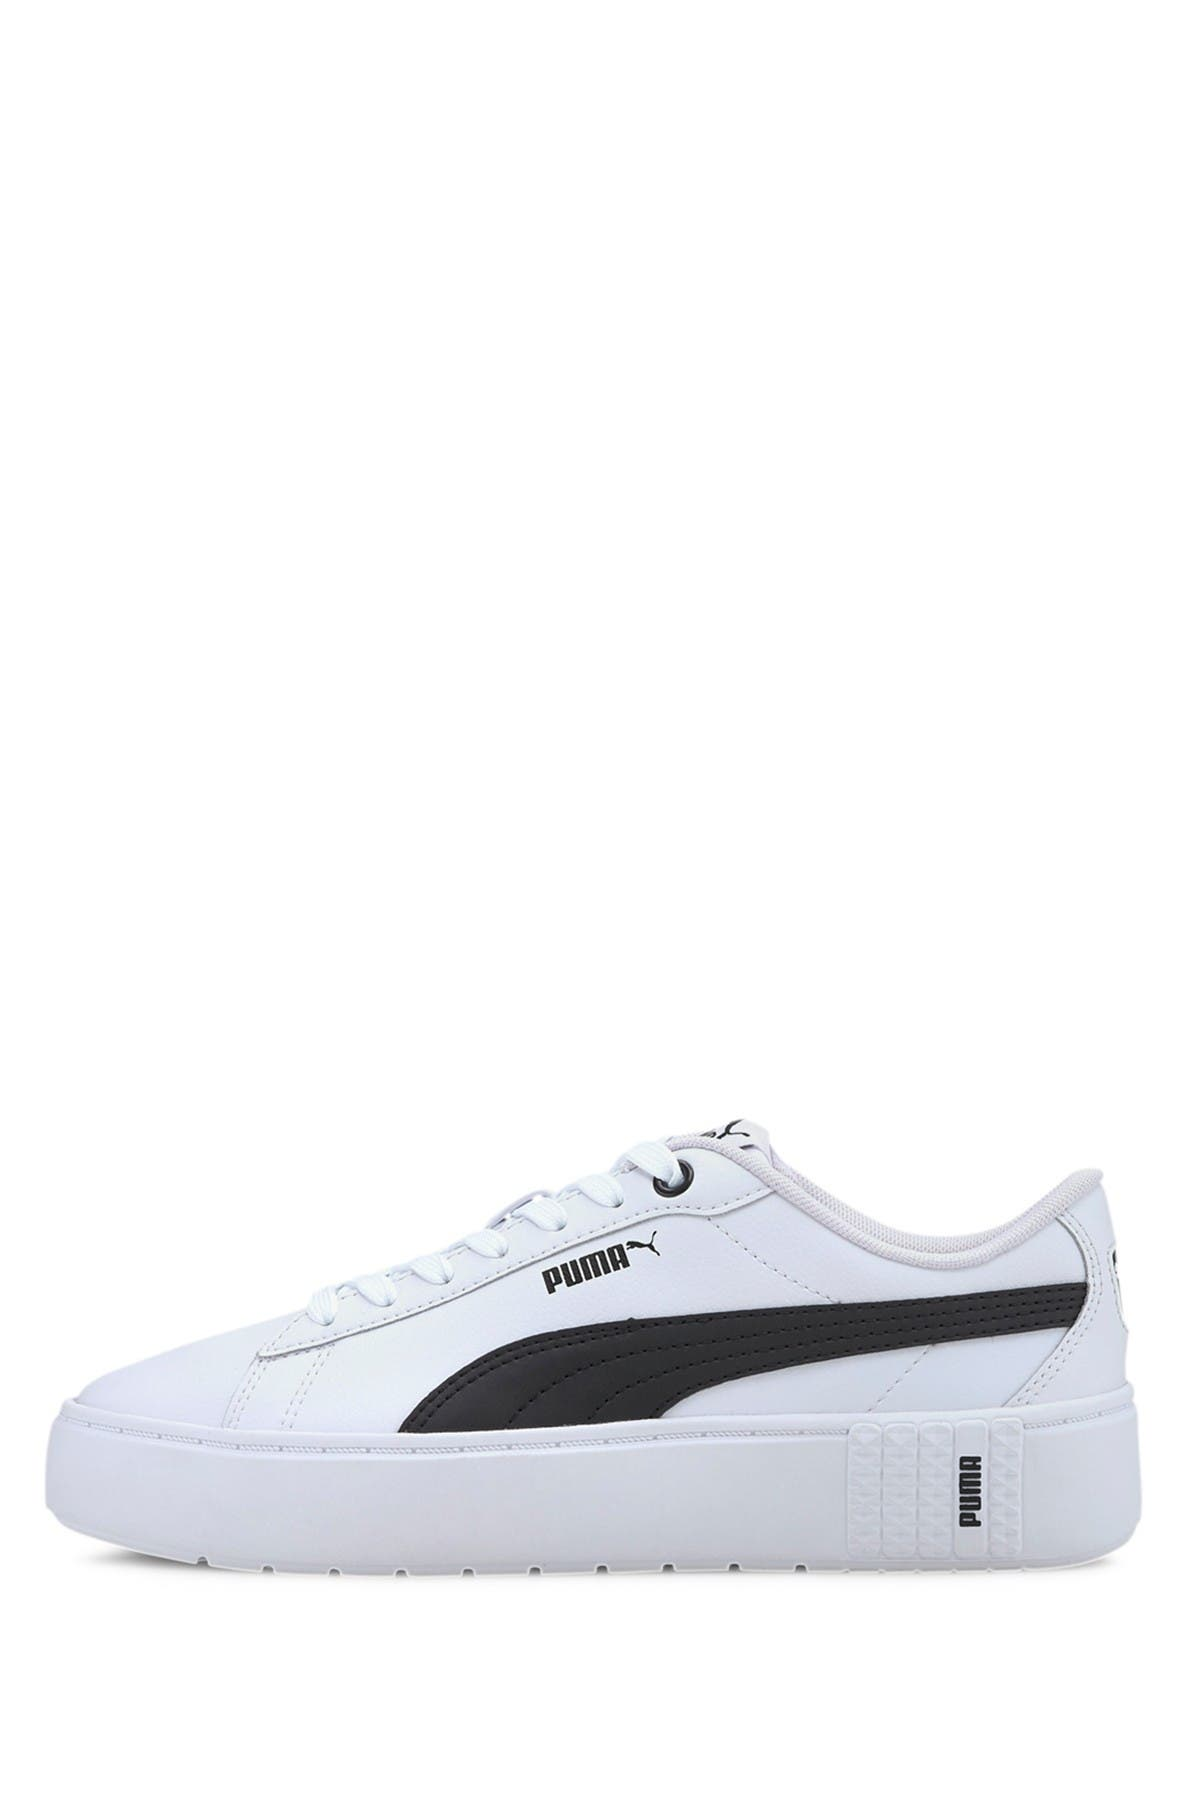 Image of PUMA Smash Platform V2 Sneaker